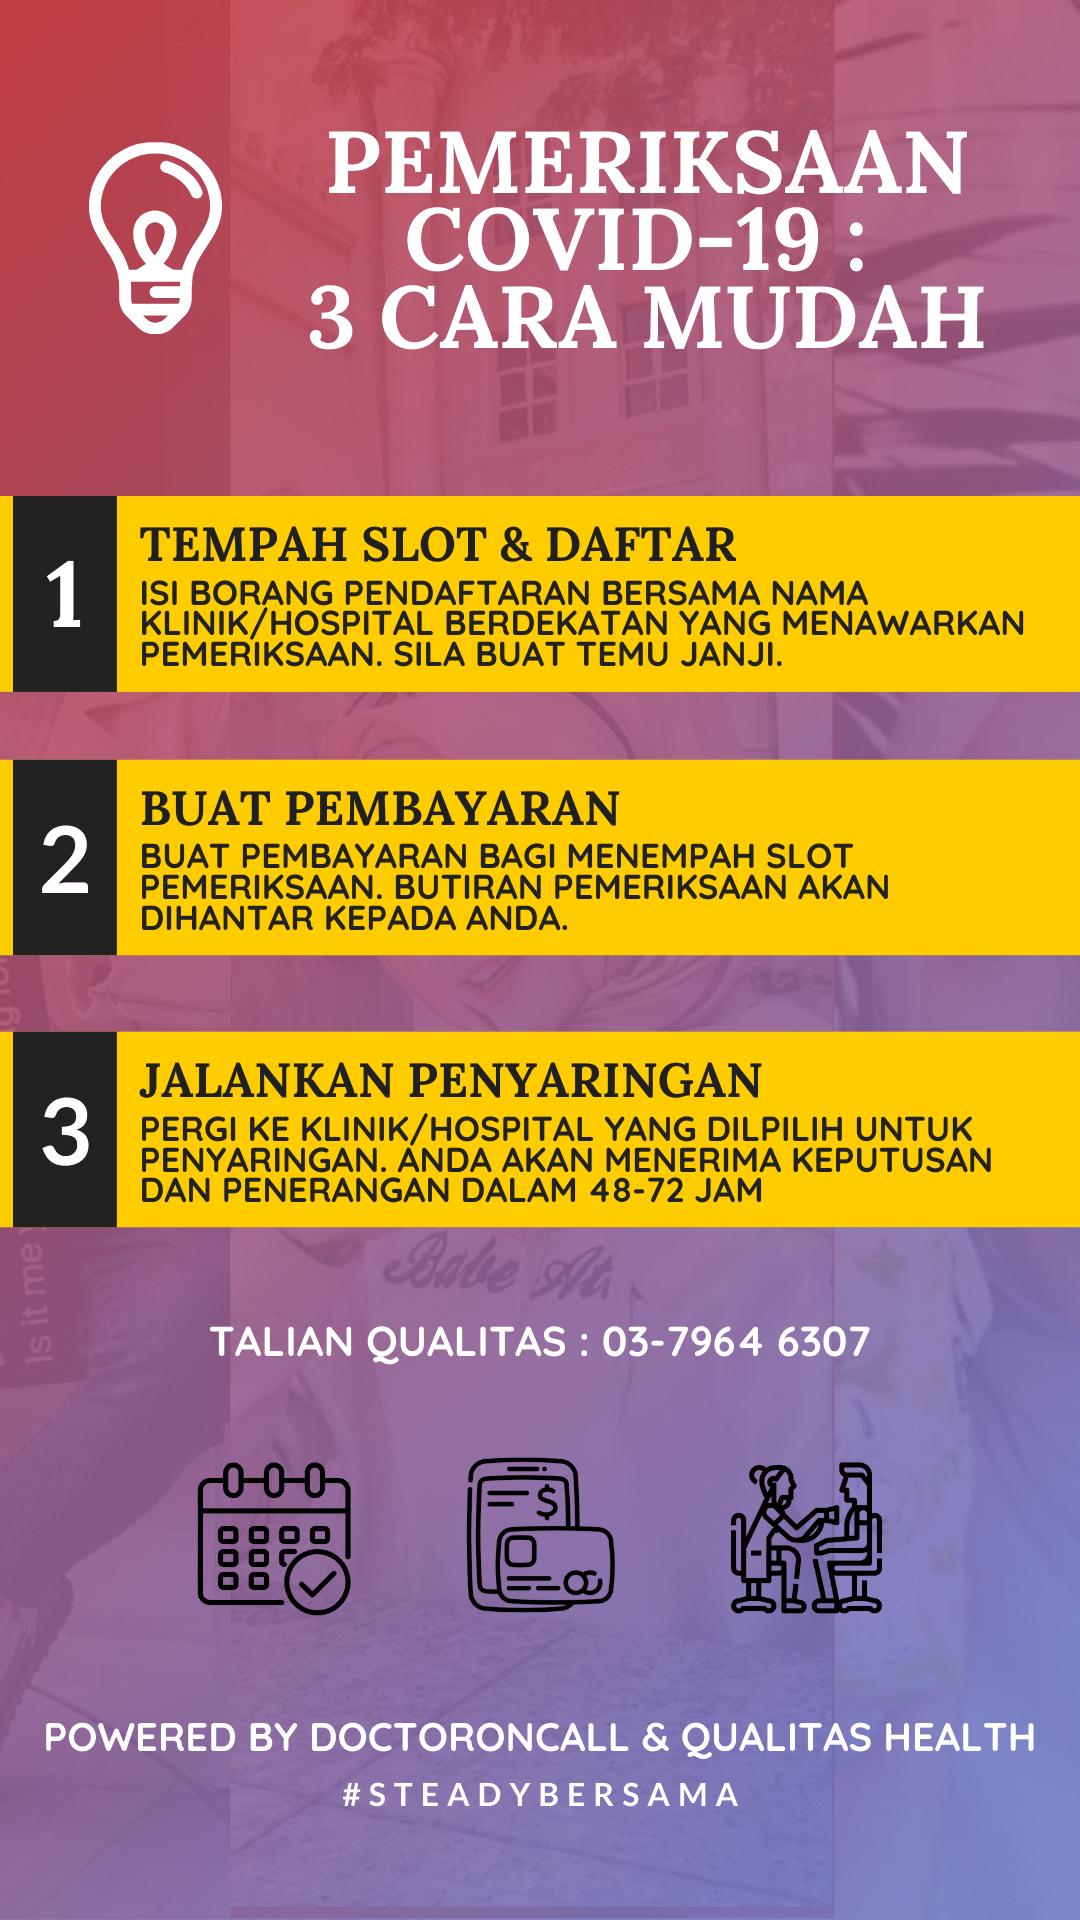 Material - SushiVid+Covid+19+Aid+-+covid-19-3-steps-check+(Malay)